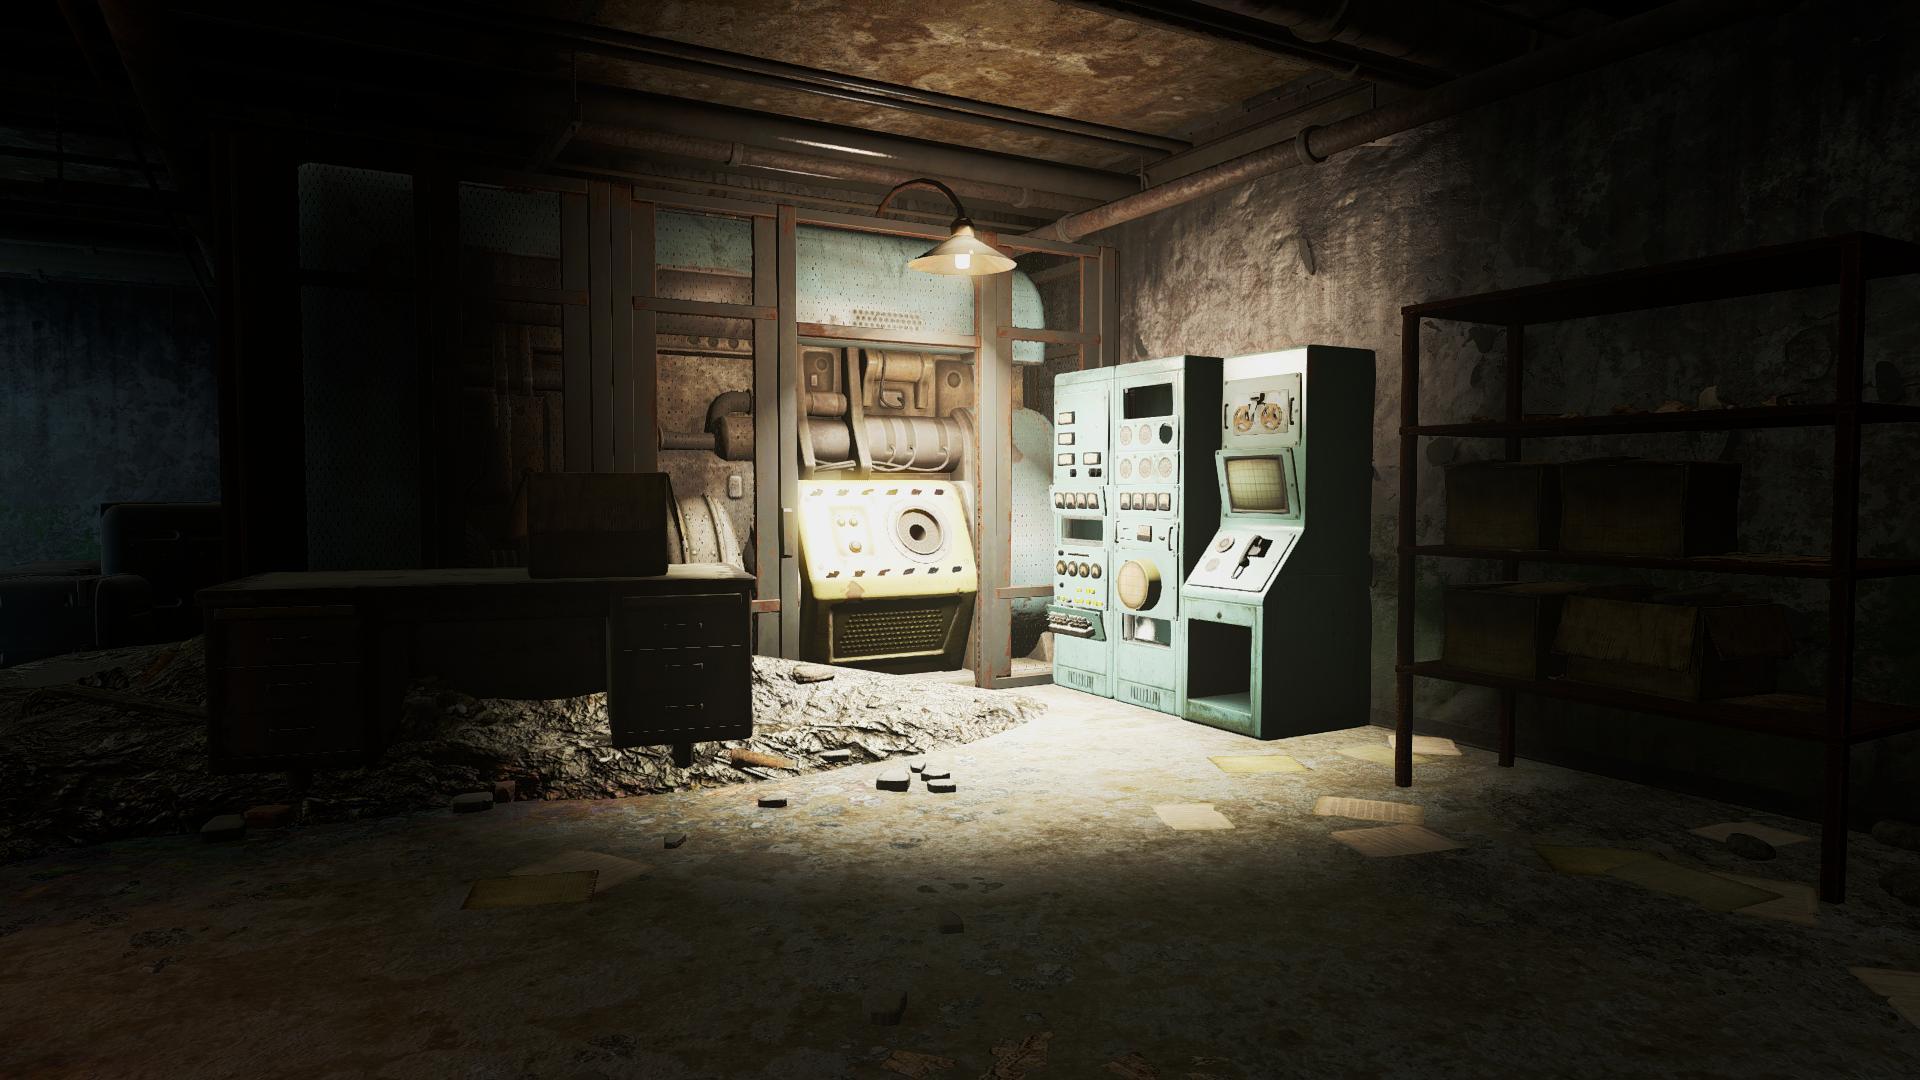 00020.Jpg - Fallout 4